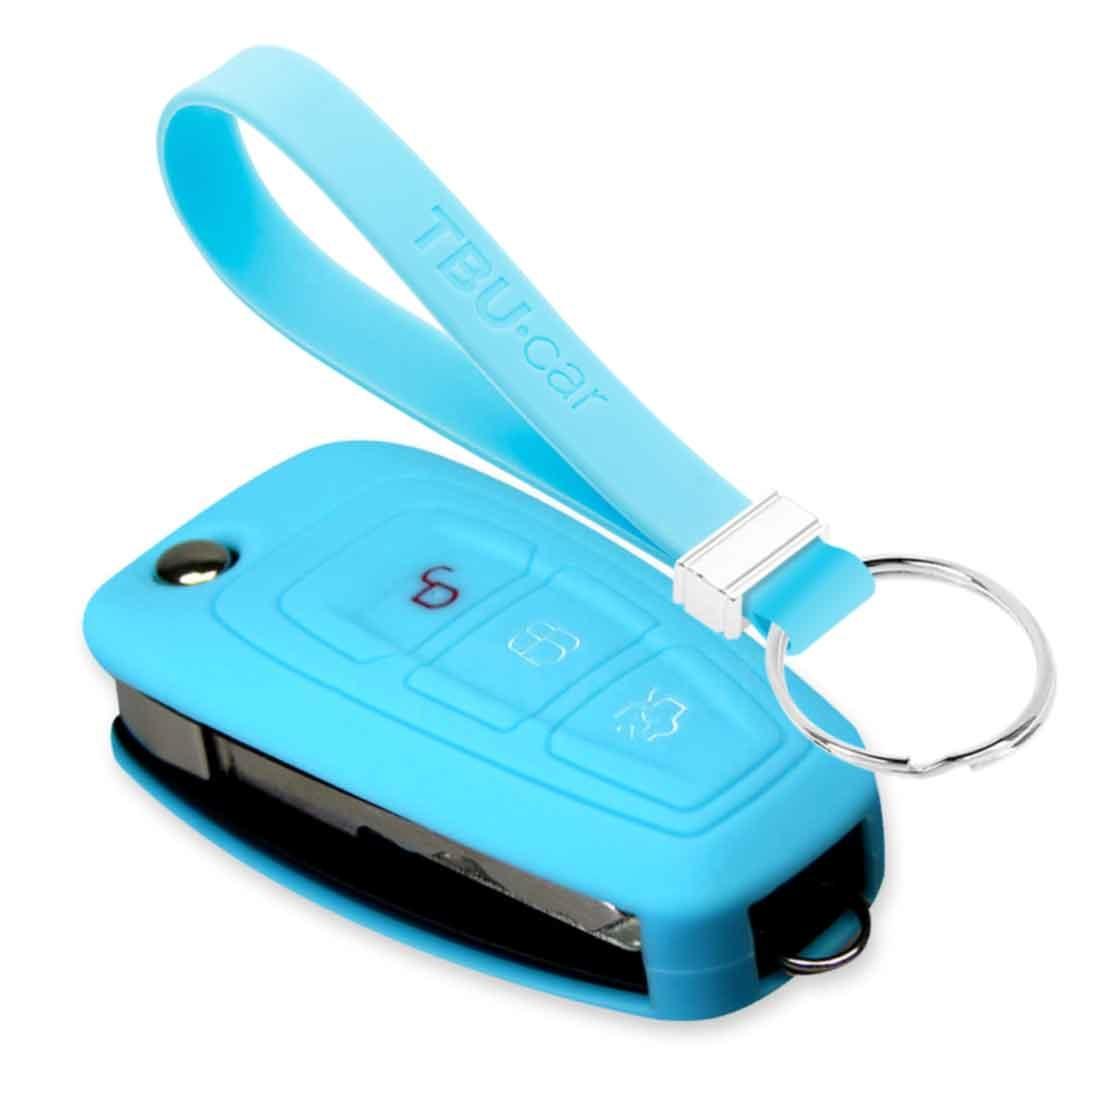 TBU car TBU car Sleutel cover compatibel met Ford - Silicone sleutelhoesje - beschermhoesje autosleutel - Lichtblauw